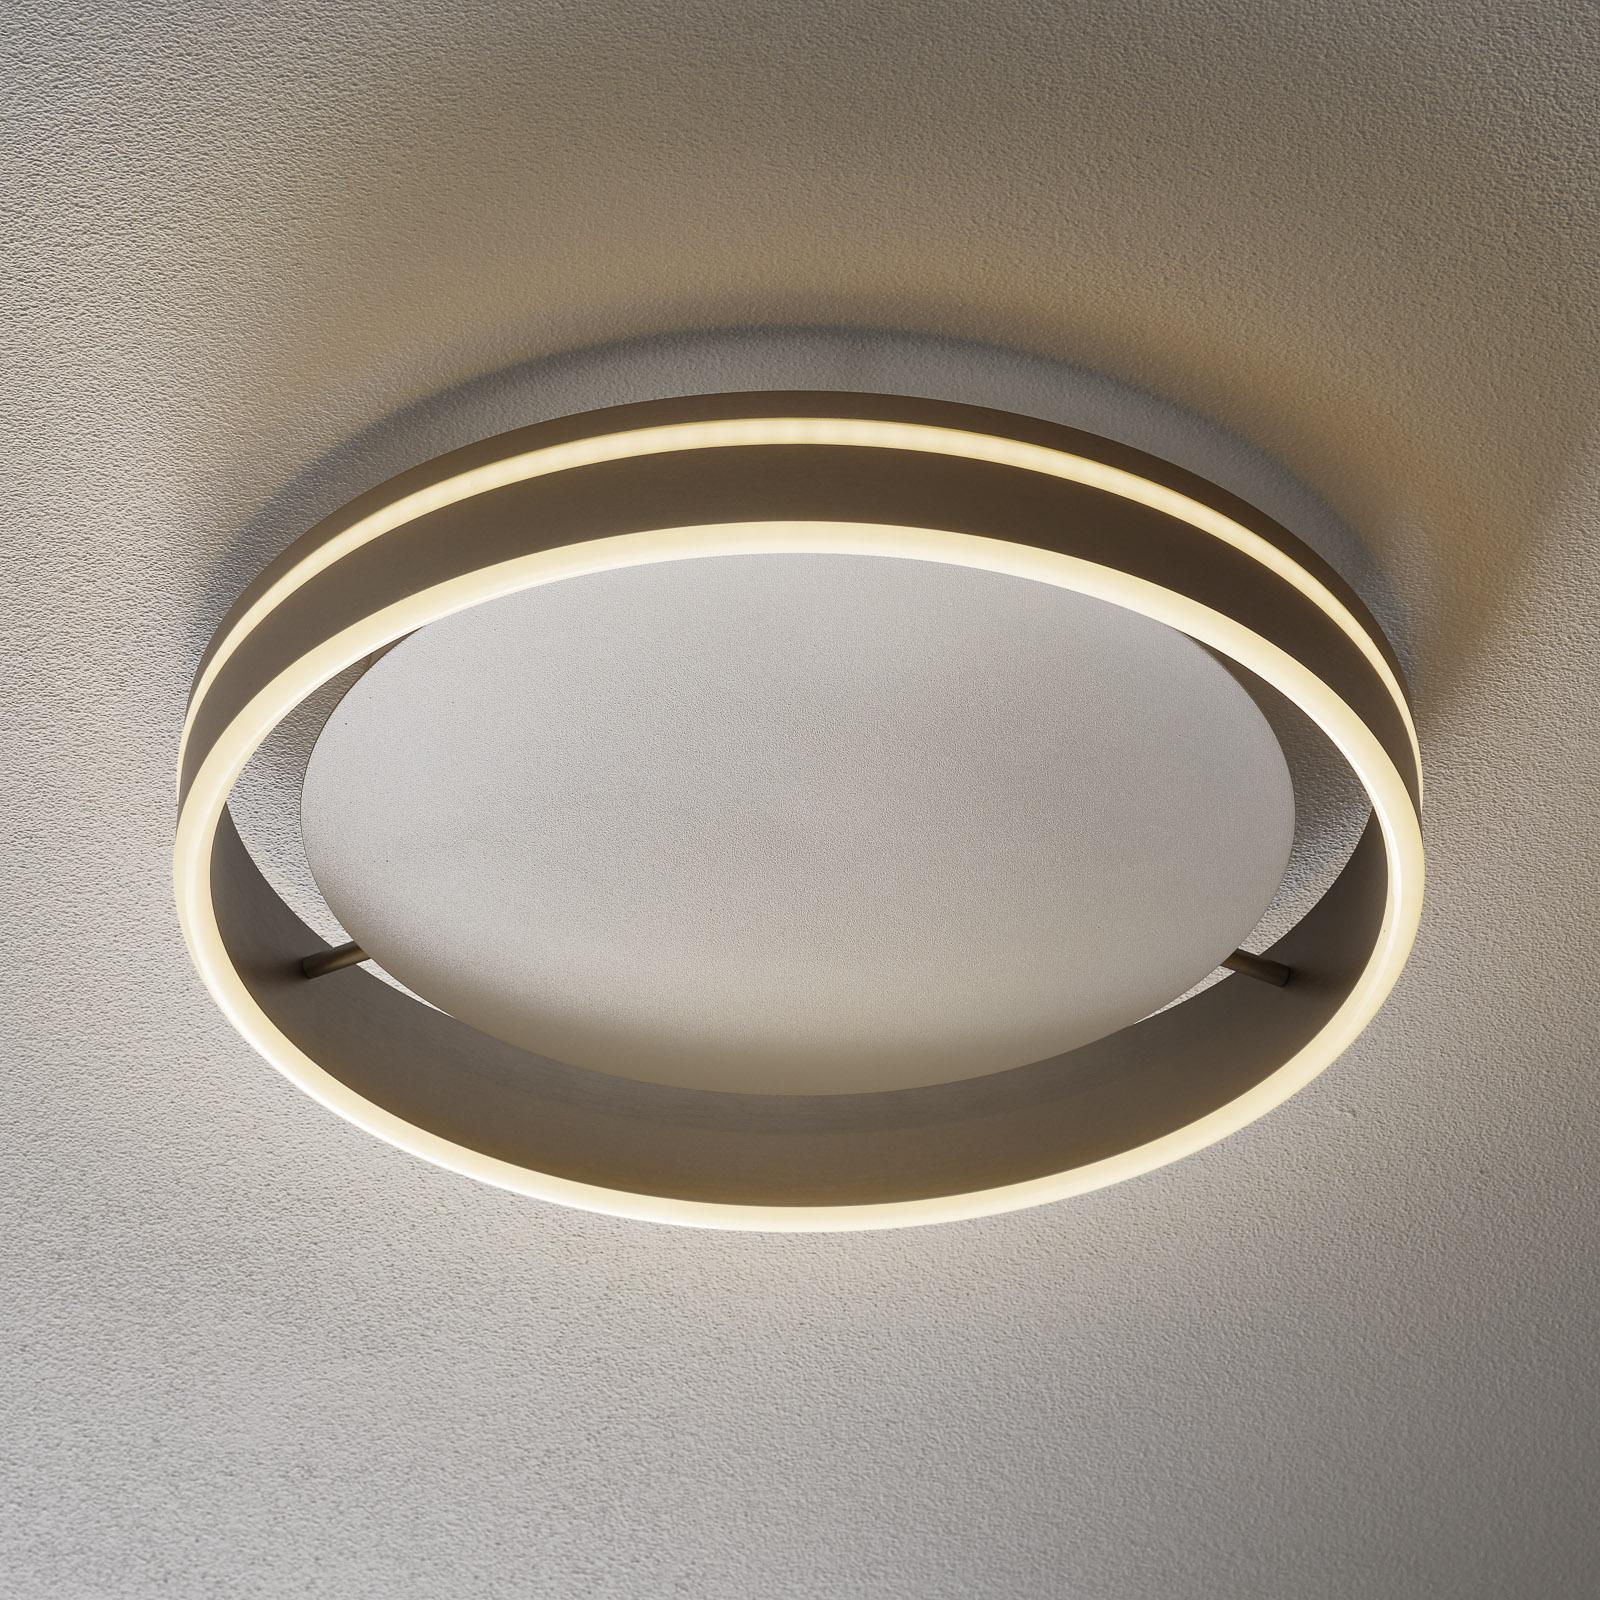 Paul Neuhaus Q-VITO lampa sufitowa LED 40cm stal